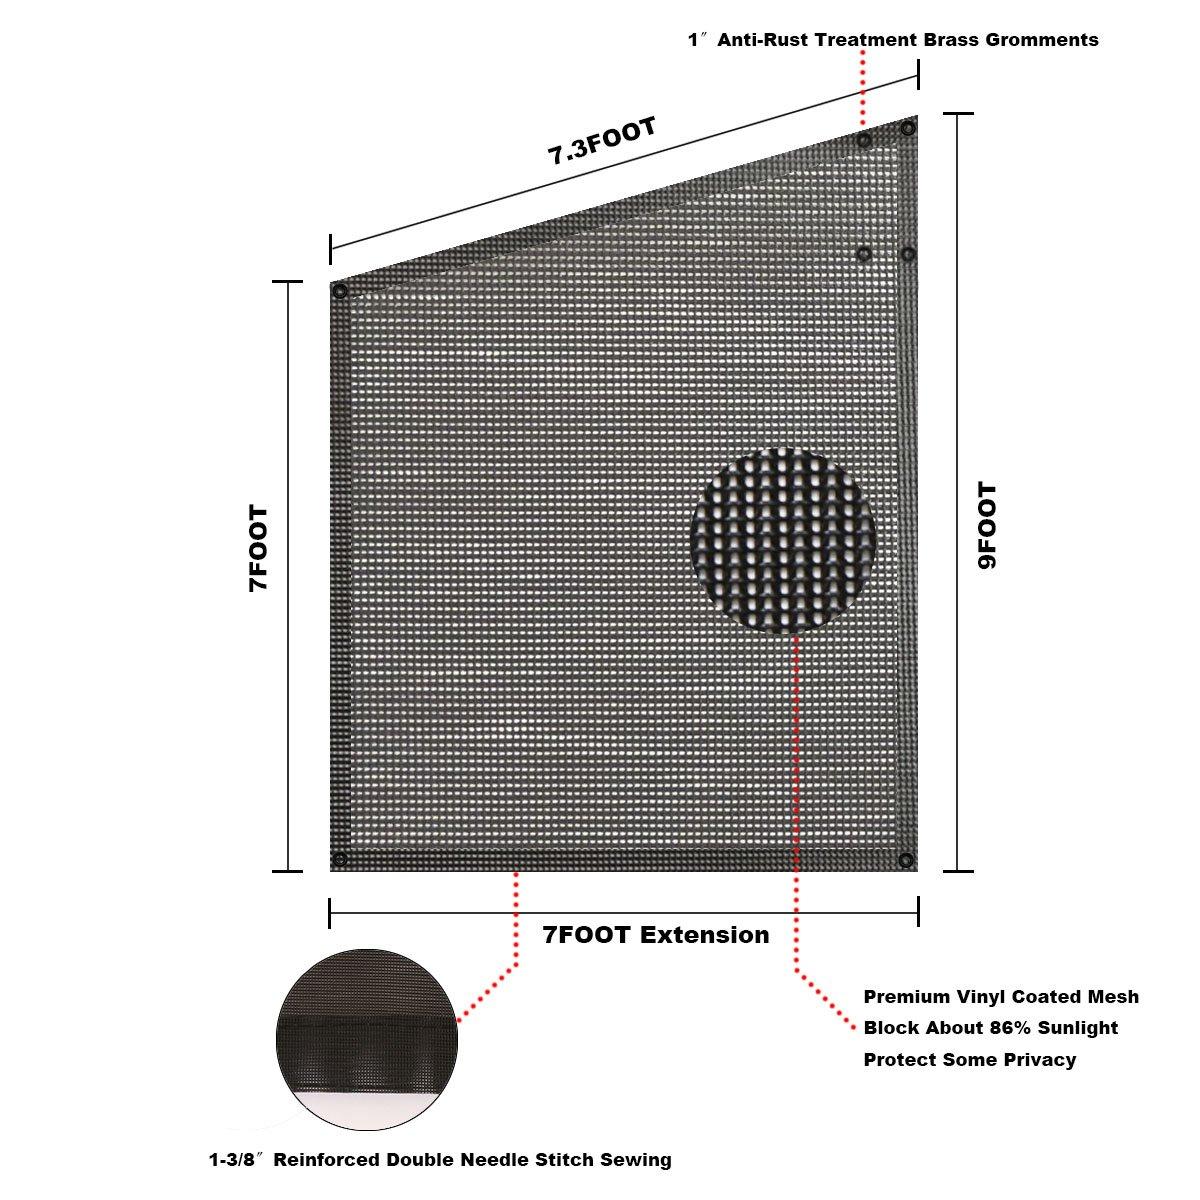 Tentproinc RV Awning Side Shade 9'X7' - Black Mesh Screen